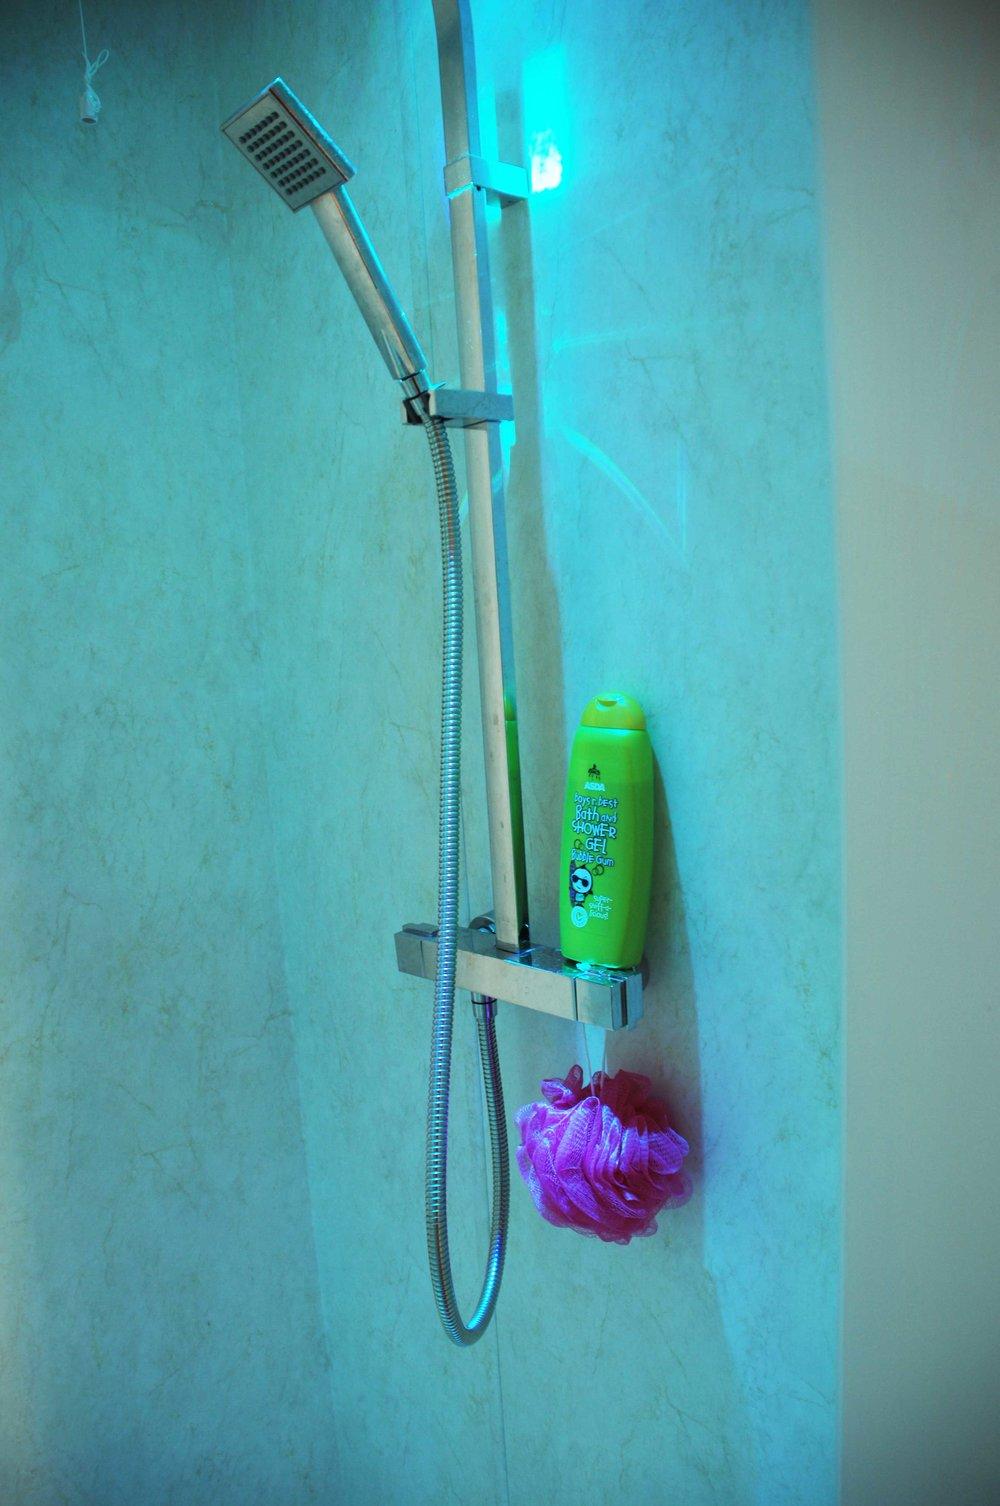 Shower-head-detail-opt.jpg